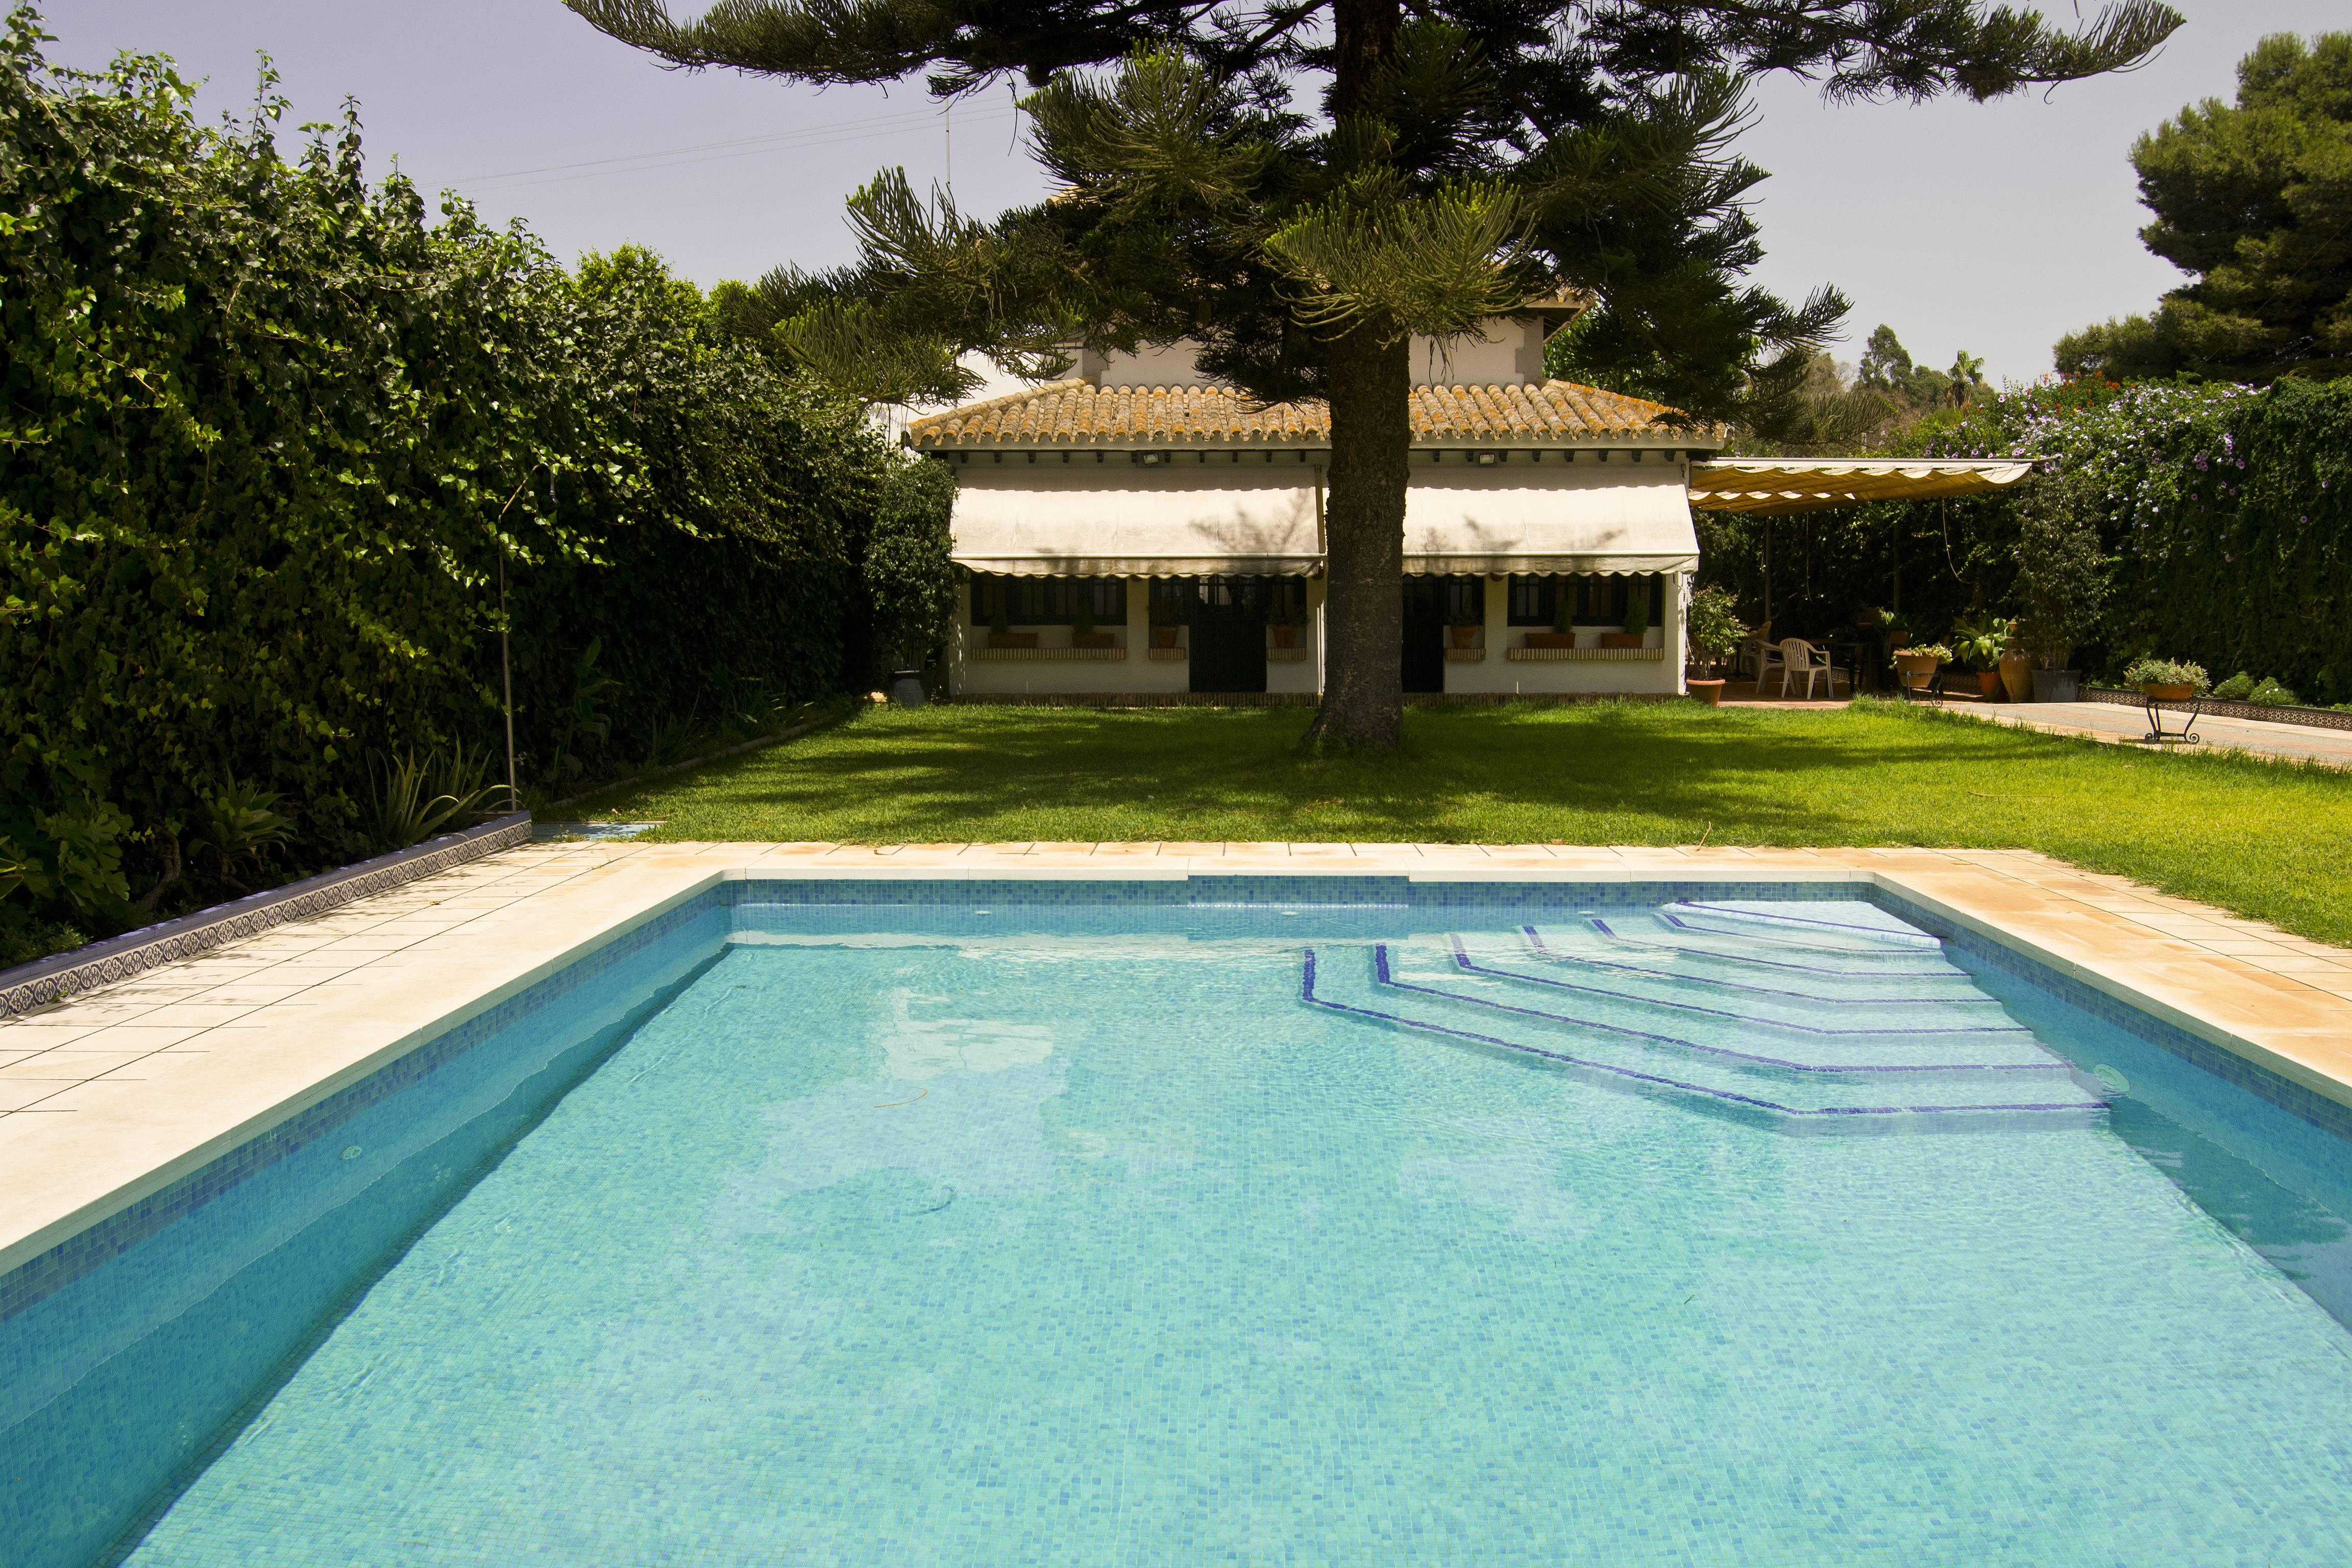 Villa en alquiler a 1000 m de la playa chipiona c diz for Pisos de alquiler en chipiona